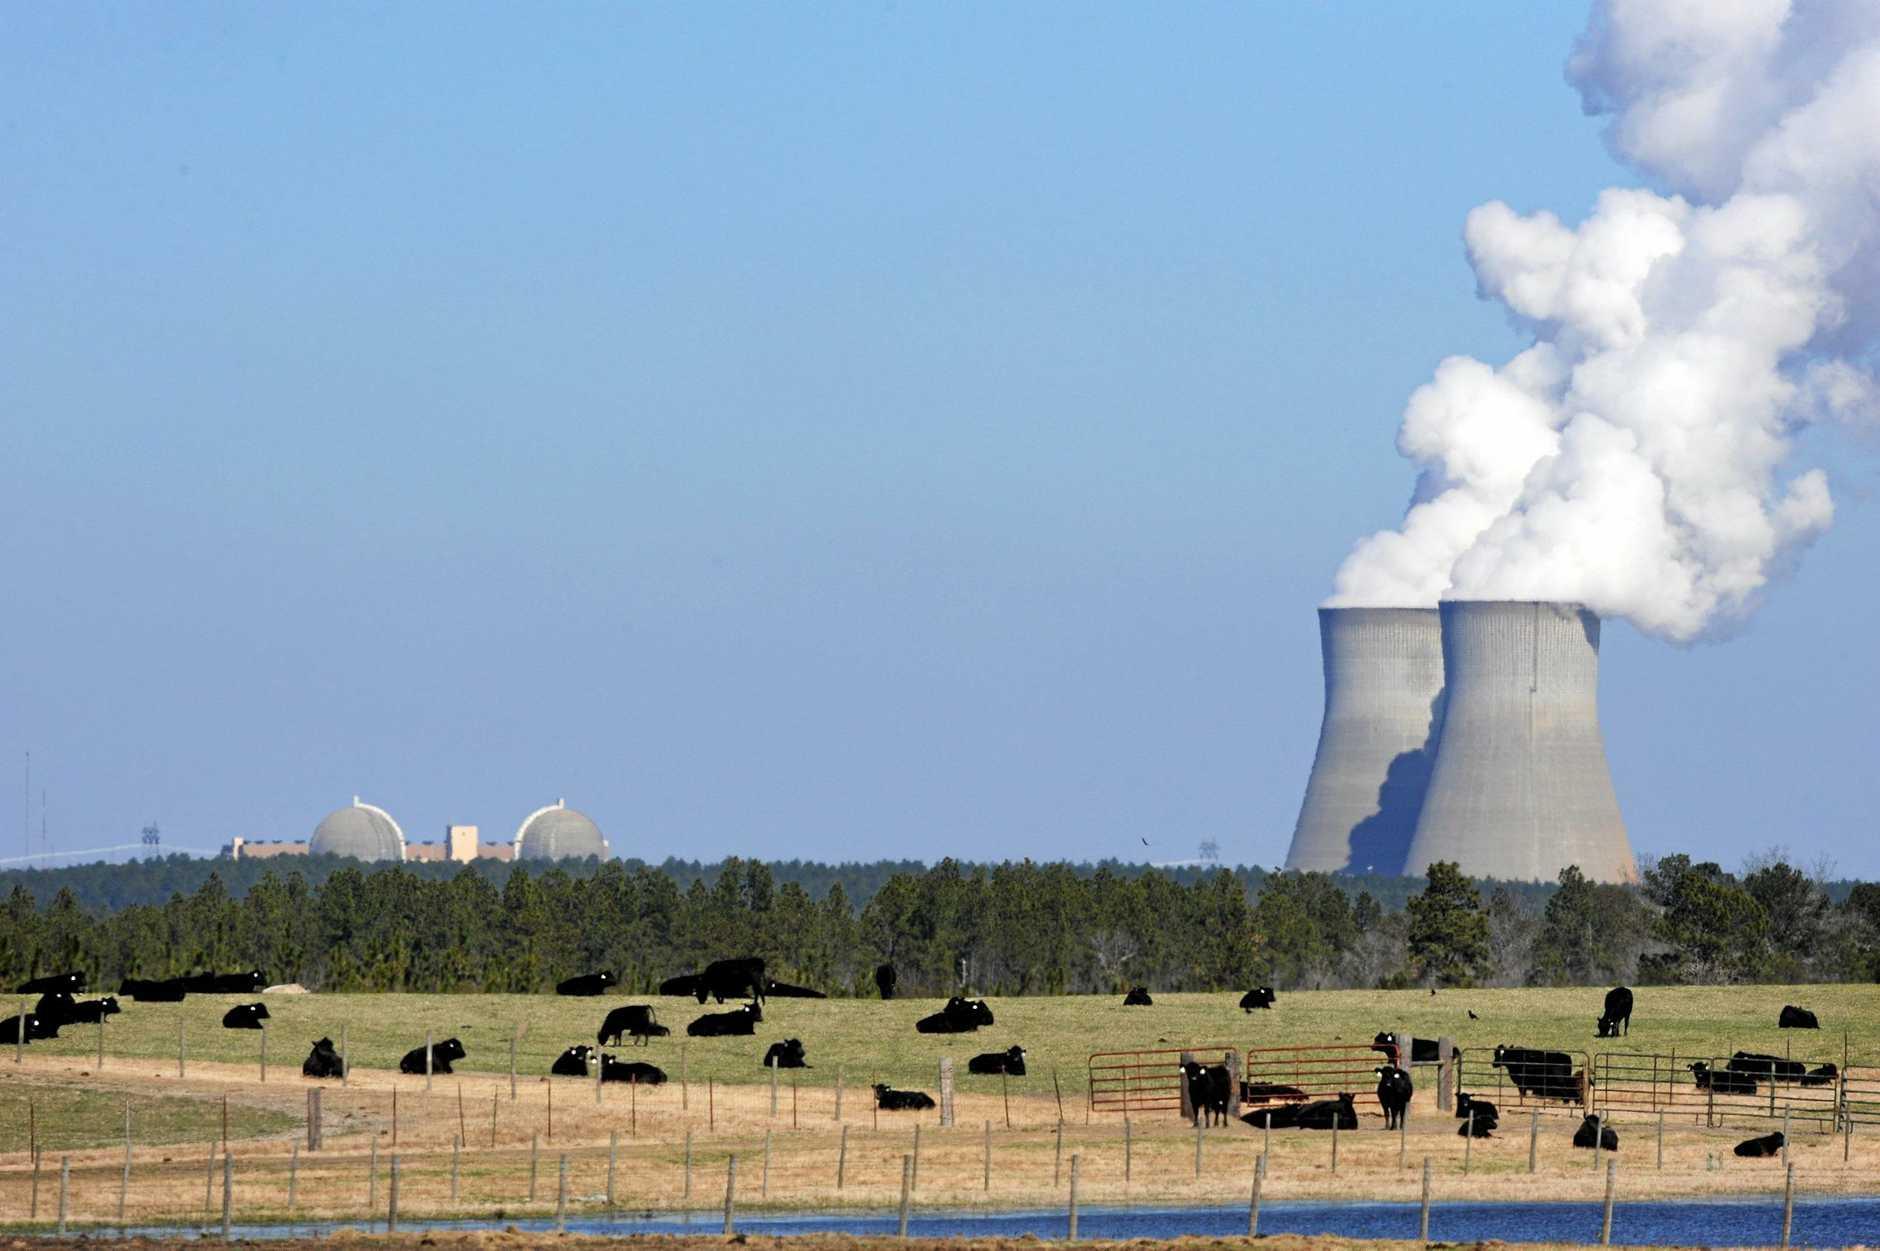 A nuclear power plant in Georgia, USA.